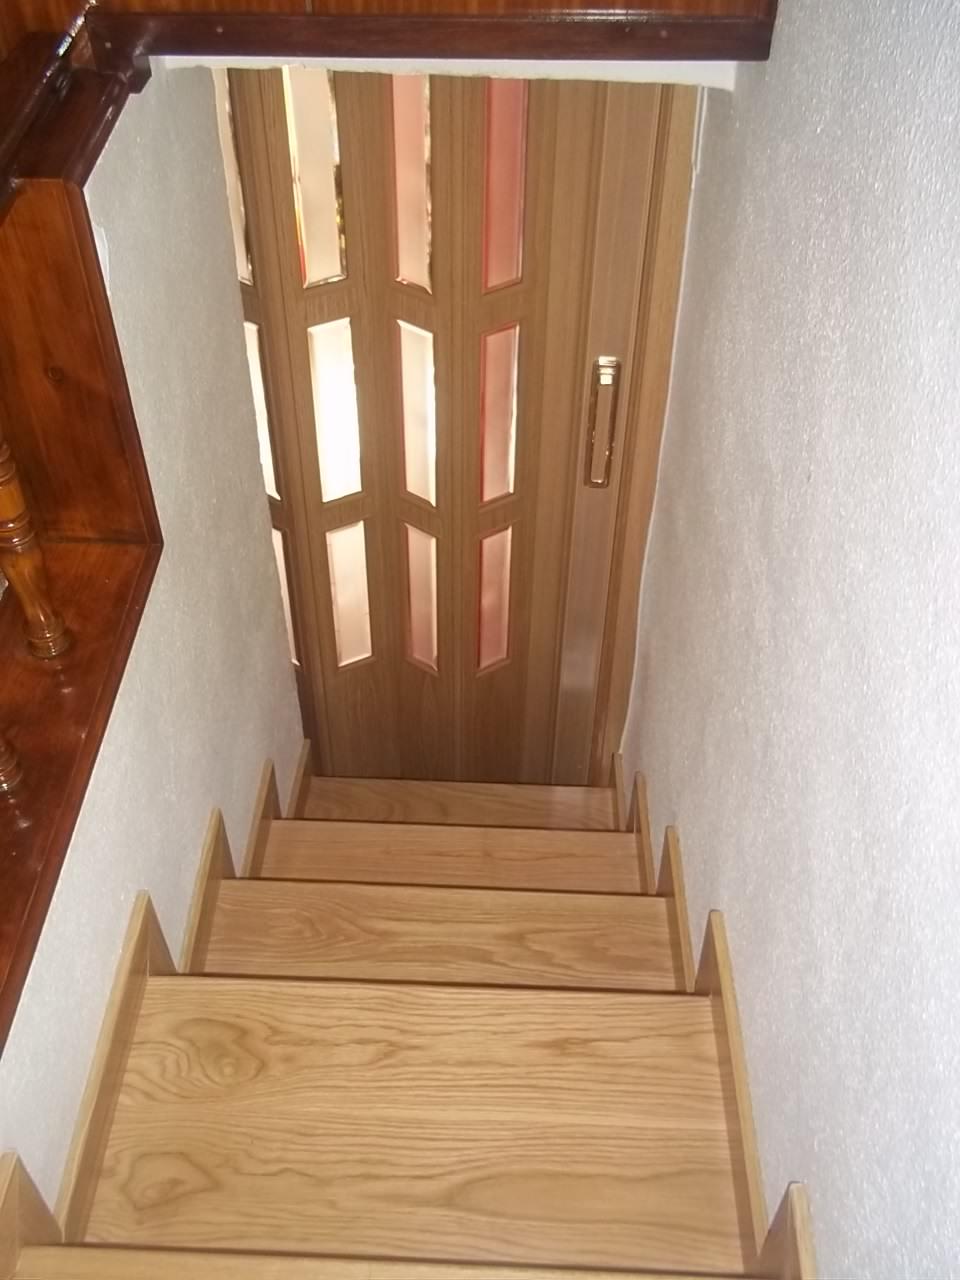 Carpinteria viosca roda puerta plegable con caseton - Puertas de escalera ...